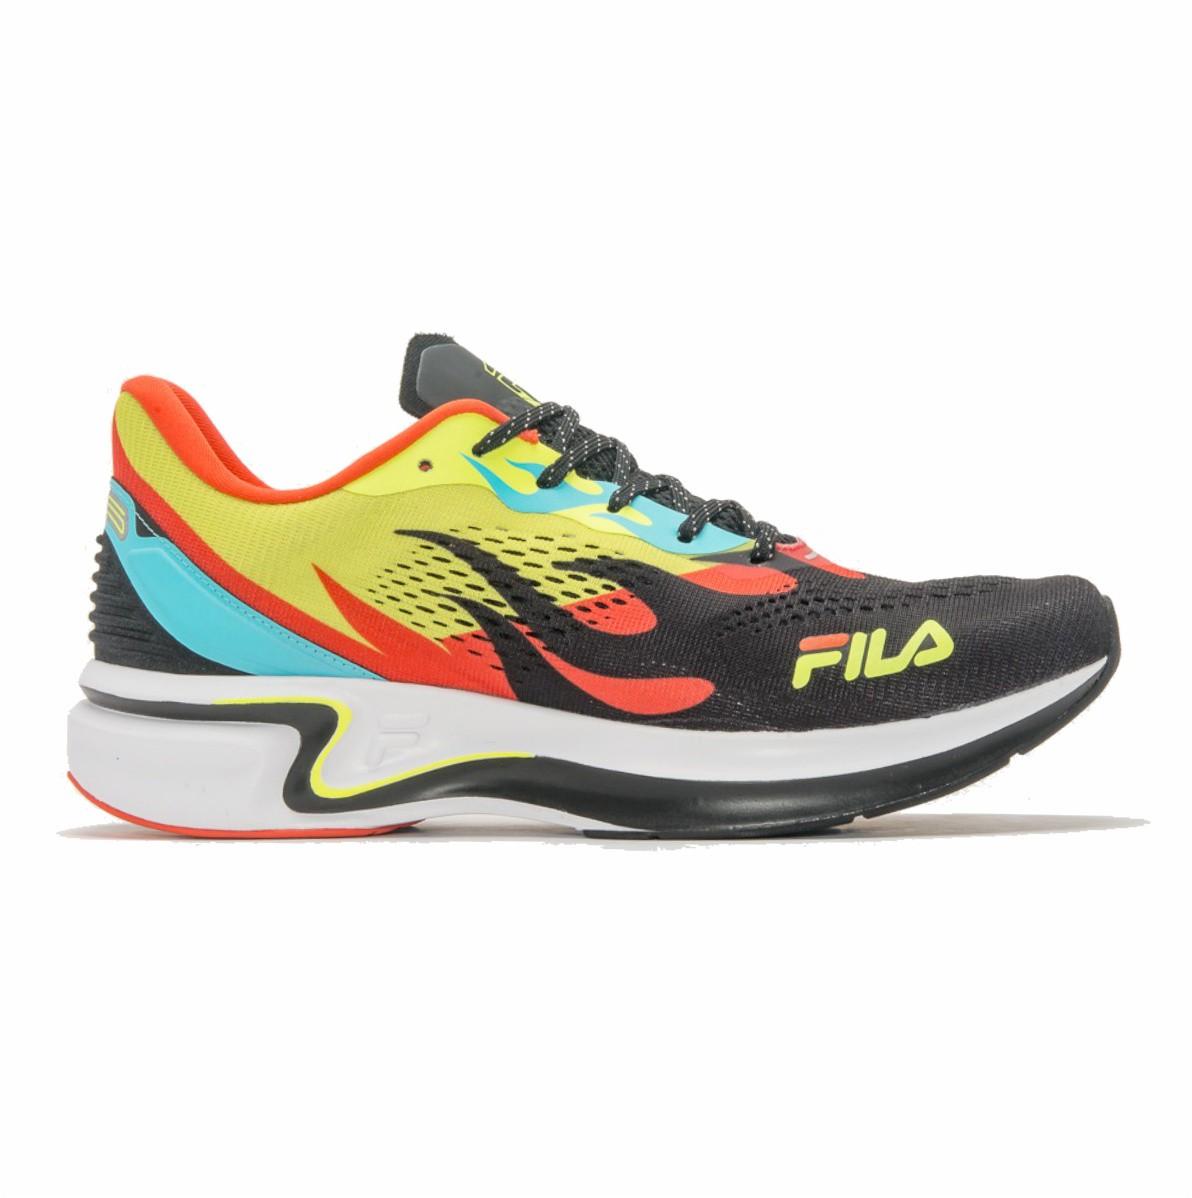 Tenis Fila Racer Silva Masculino Running Performance